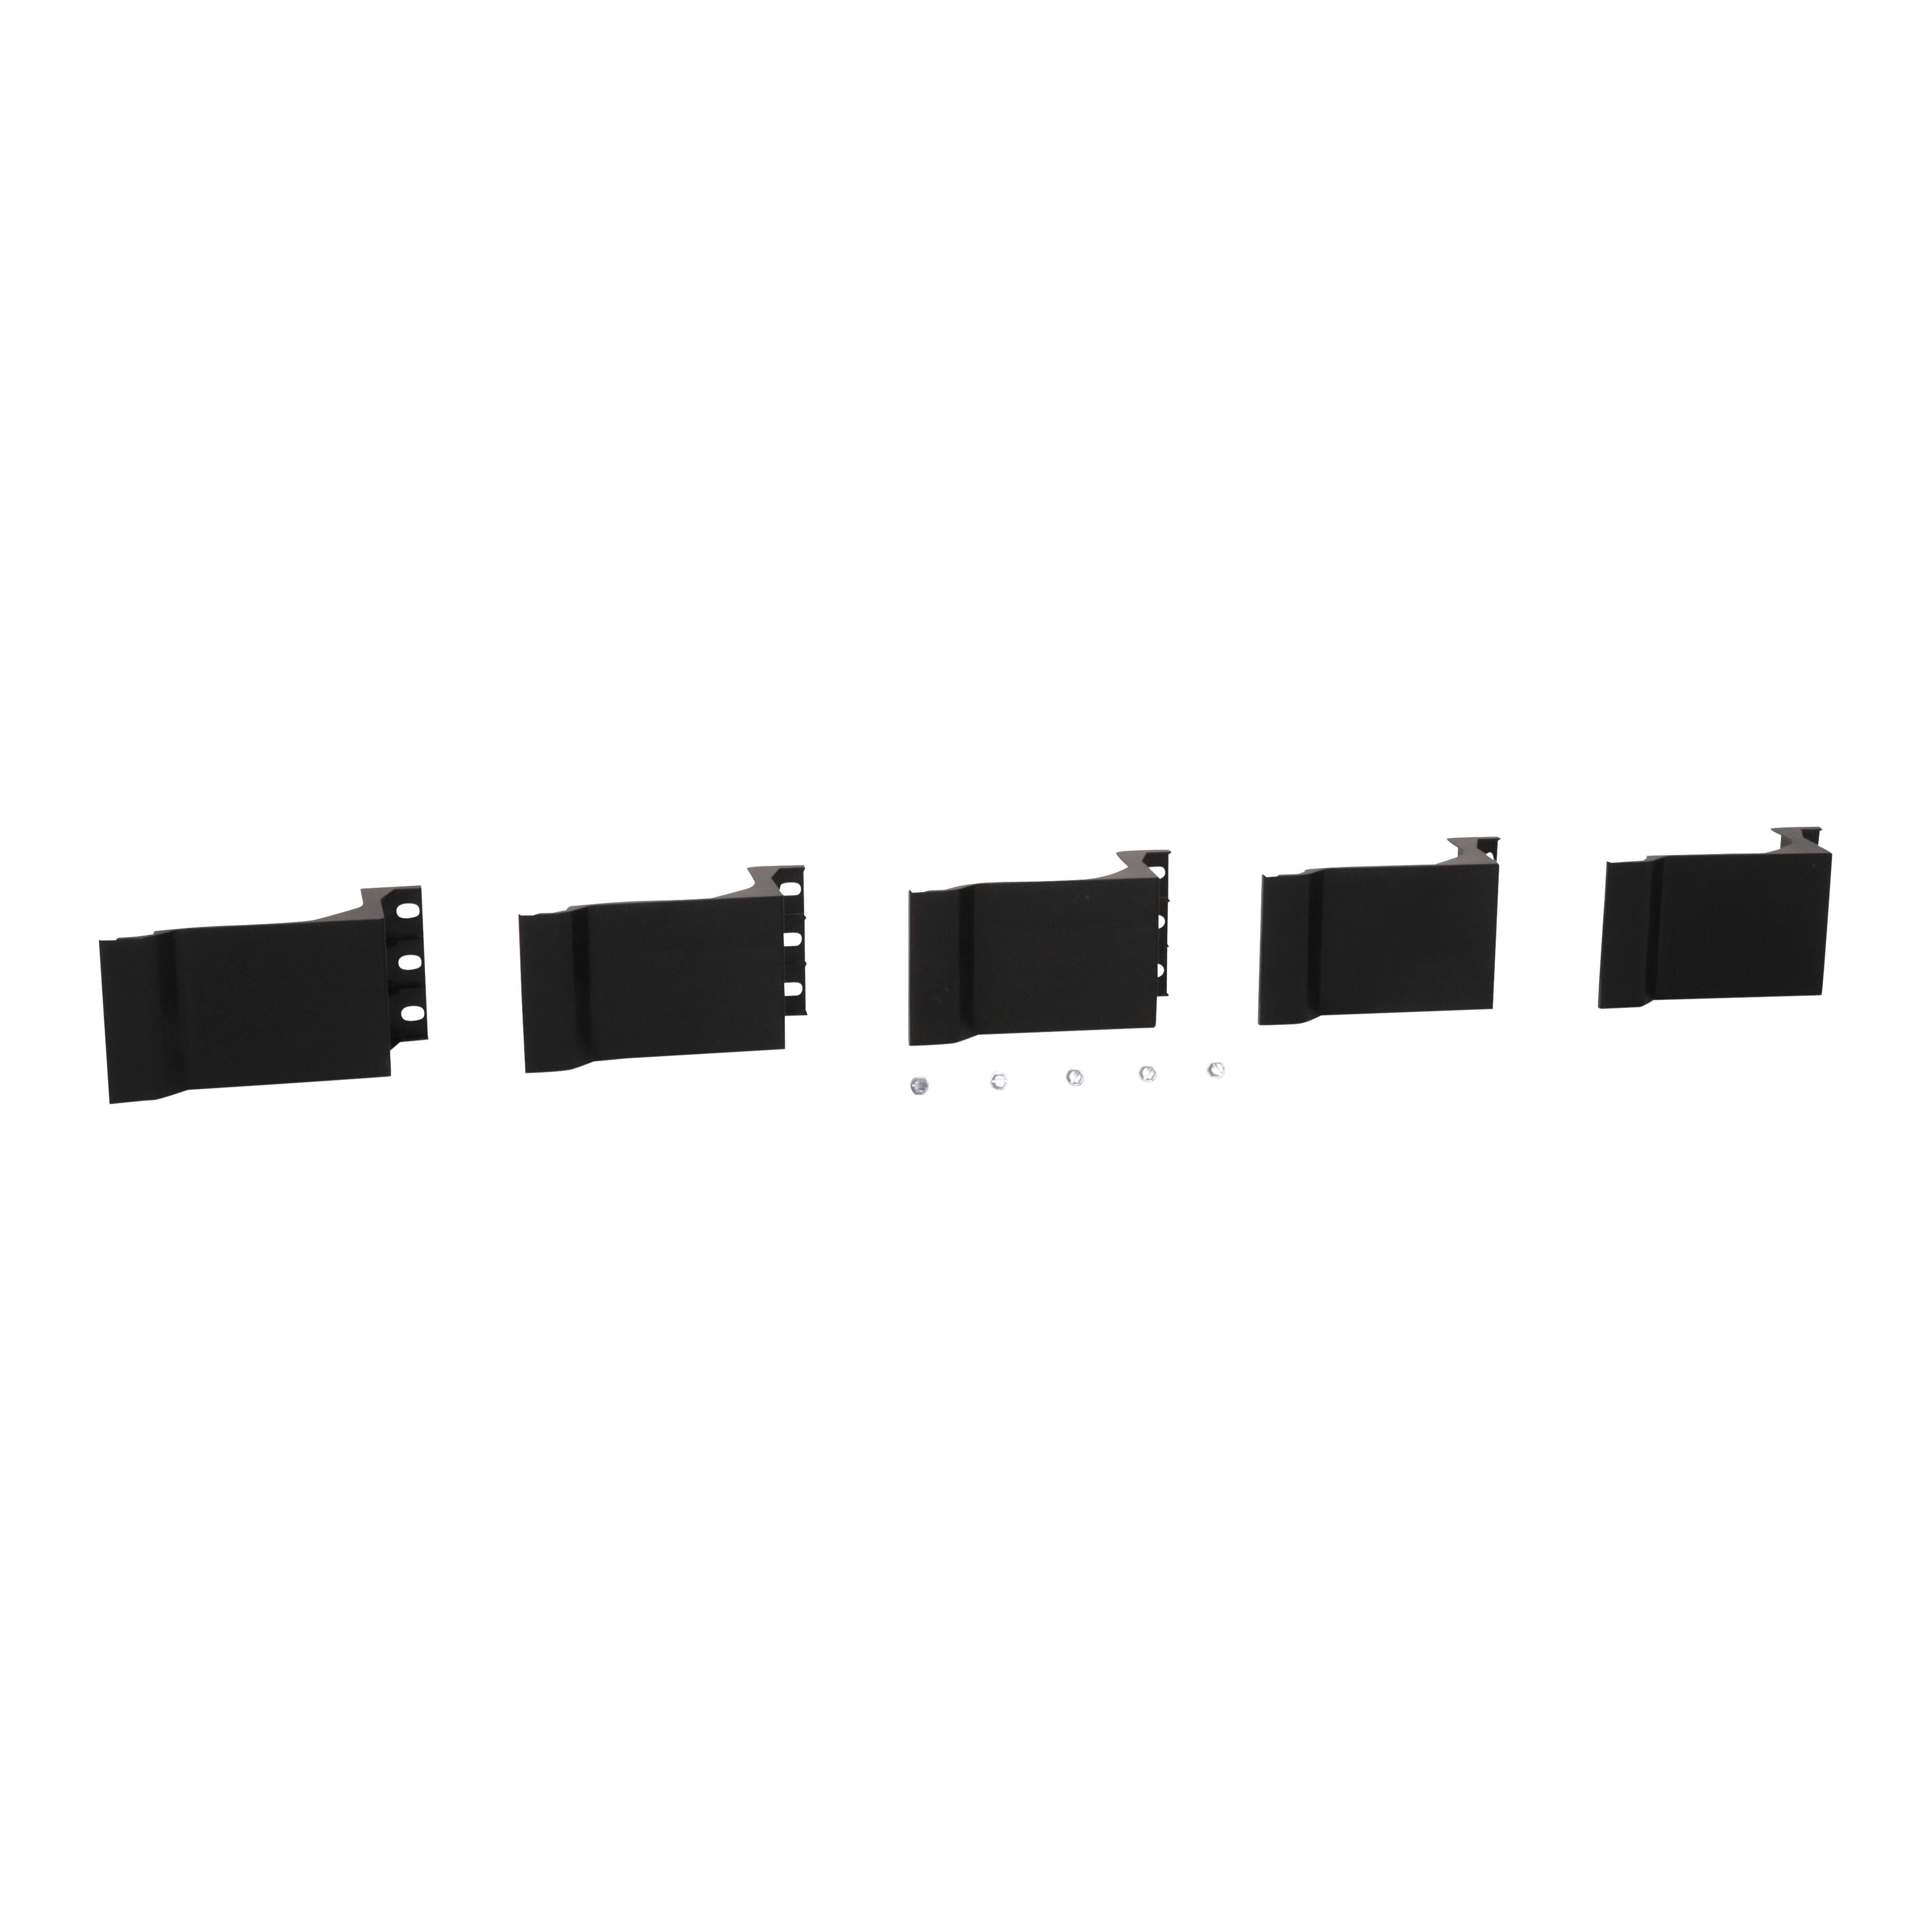 SQUARE D HNM4BL : PANELBOARD FILLER BLANK - (5 PER CASE) (Sold Per each NOT CASE)